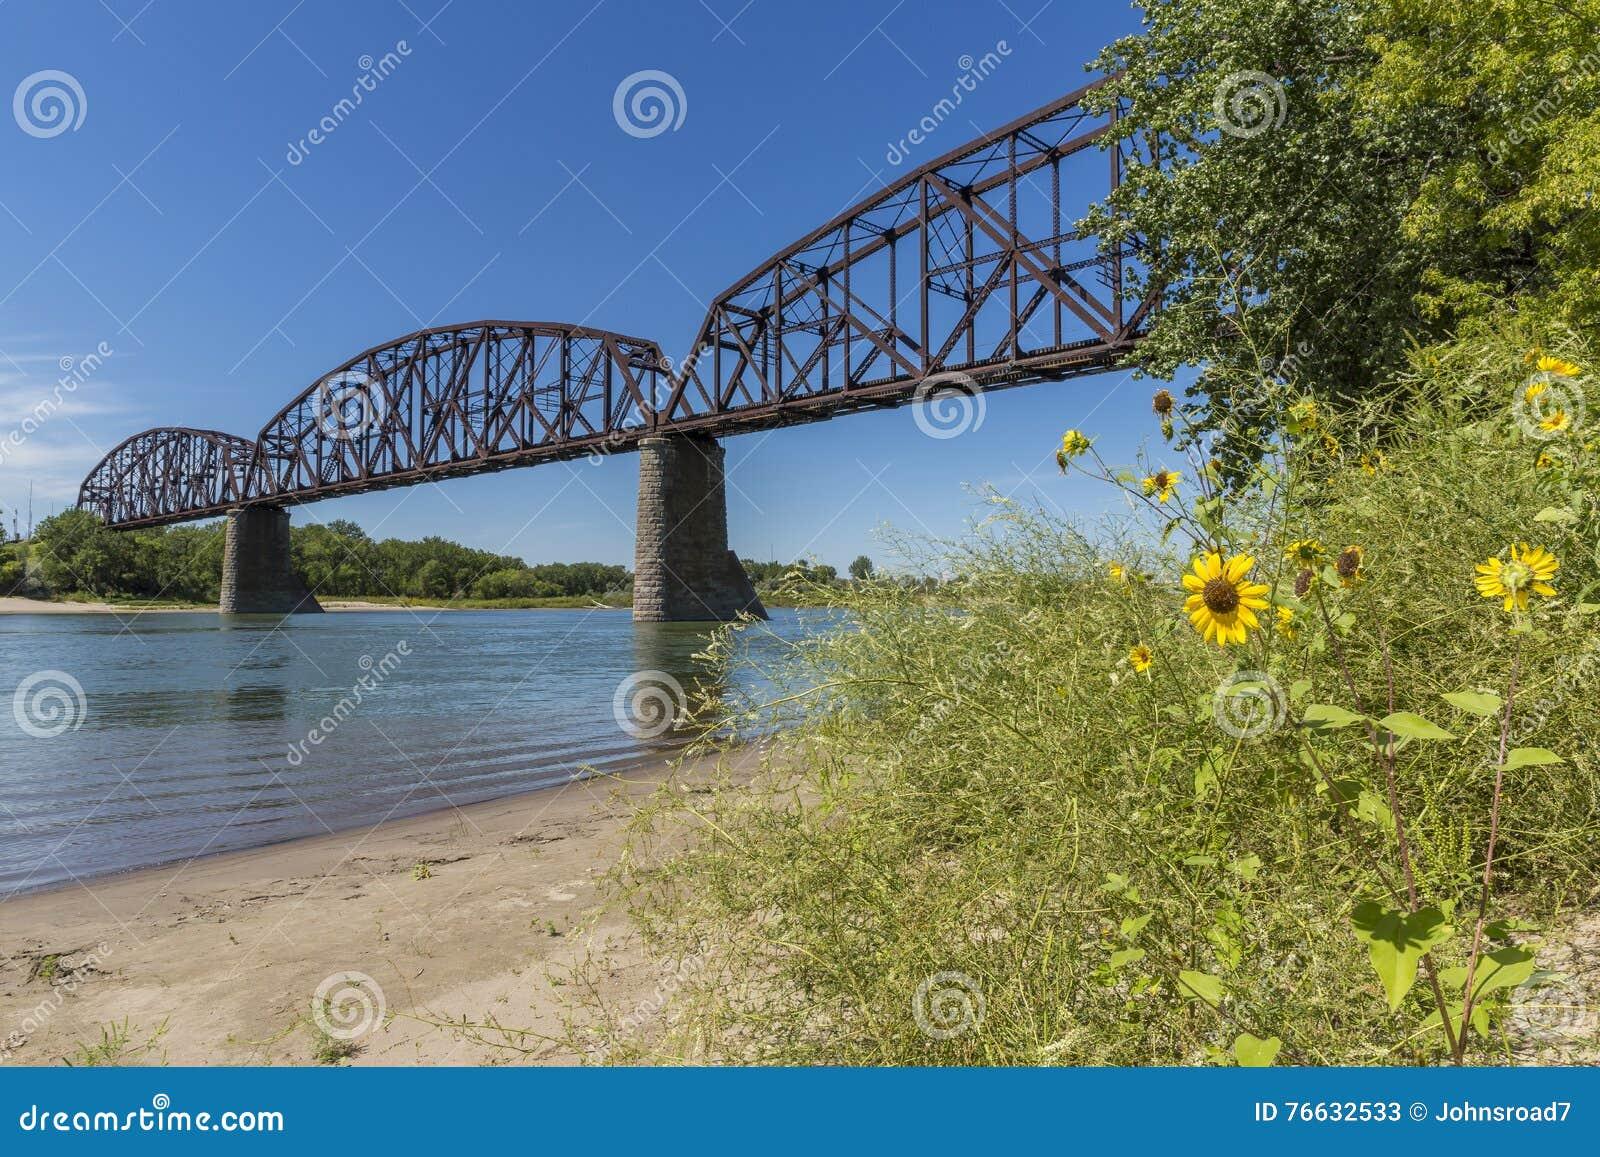 Puente del ferrocarril sobre el río Missouri